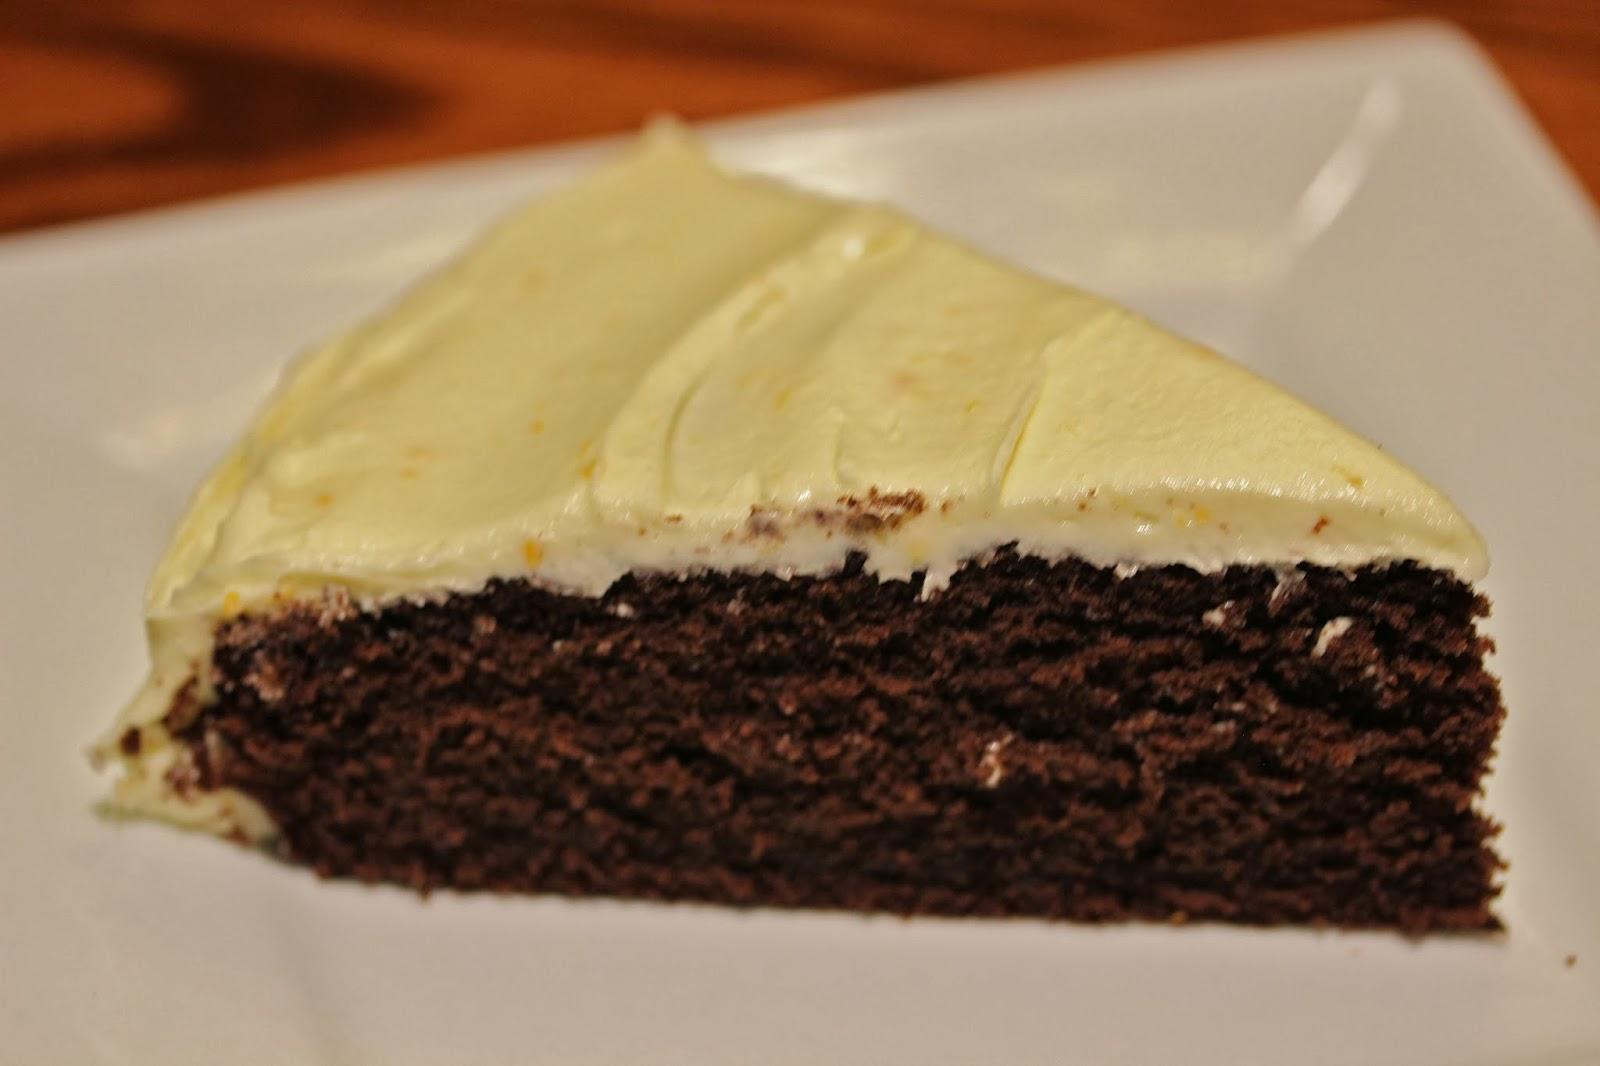 Tasty Treats: Chocolate Cake with Orange frosting